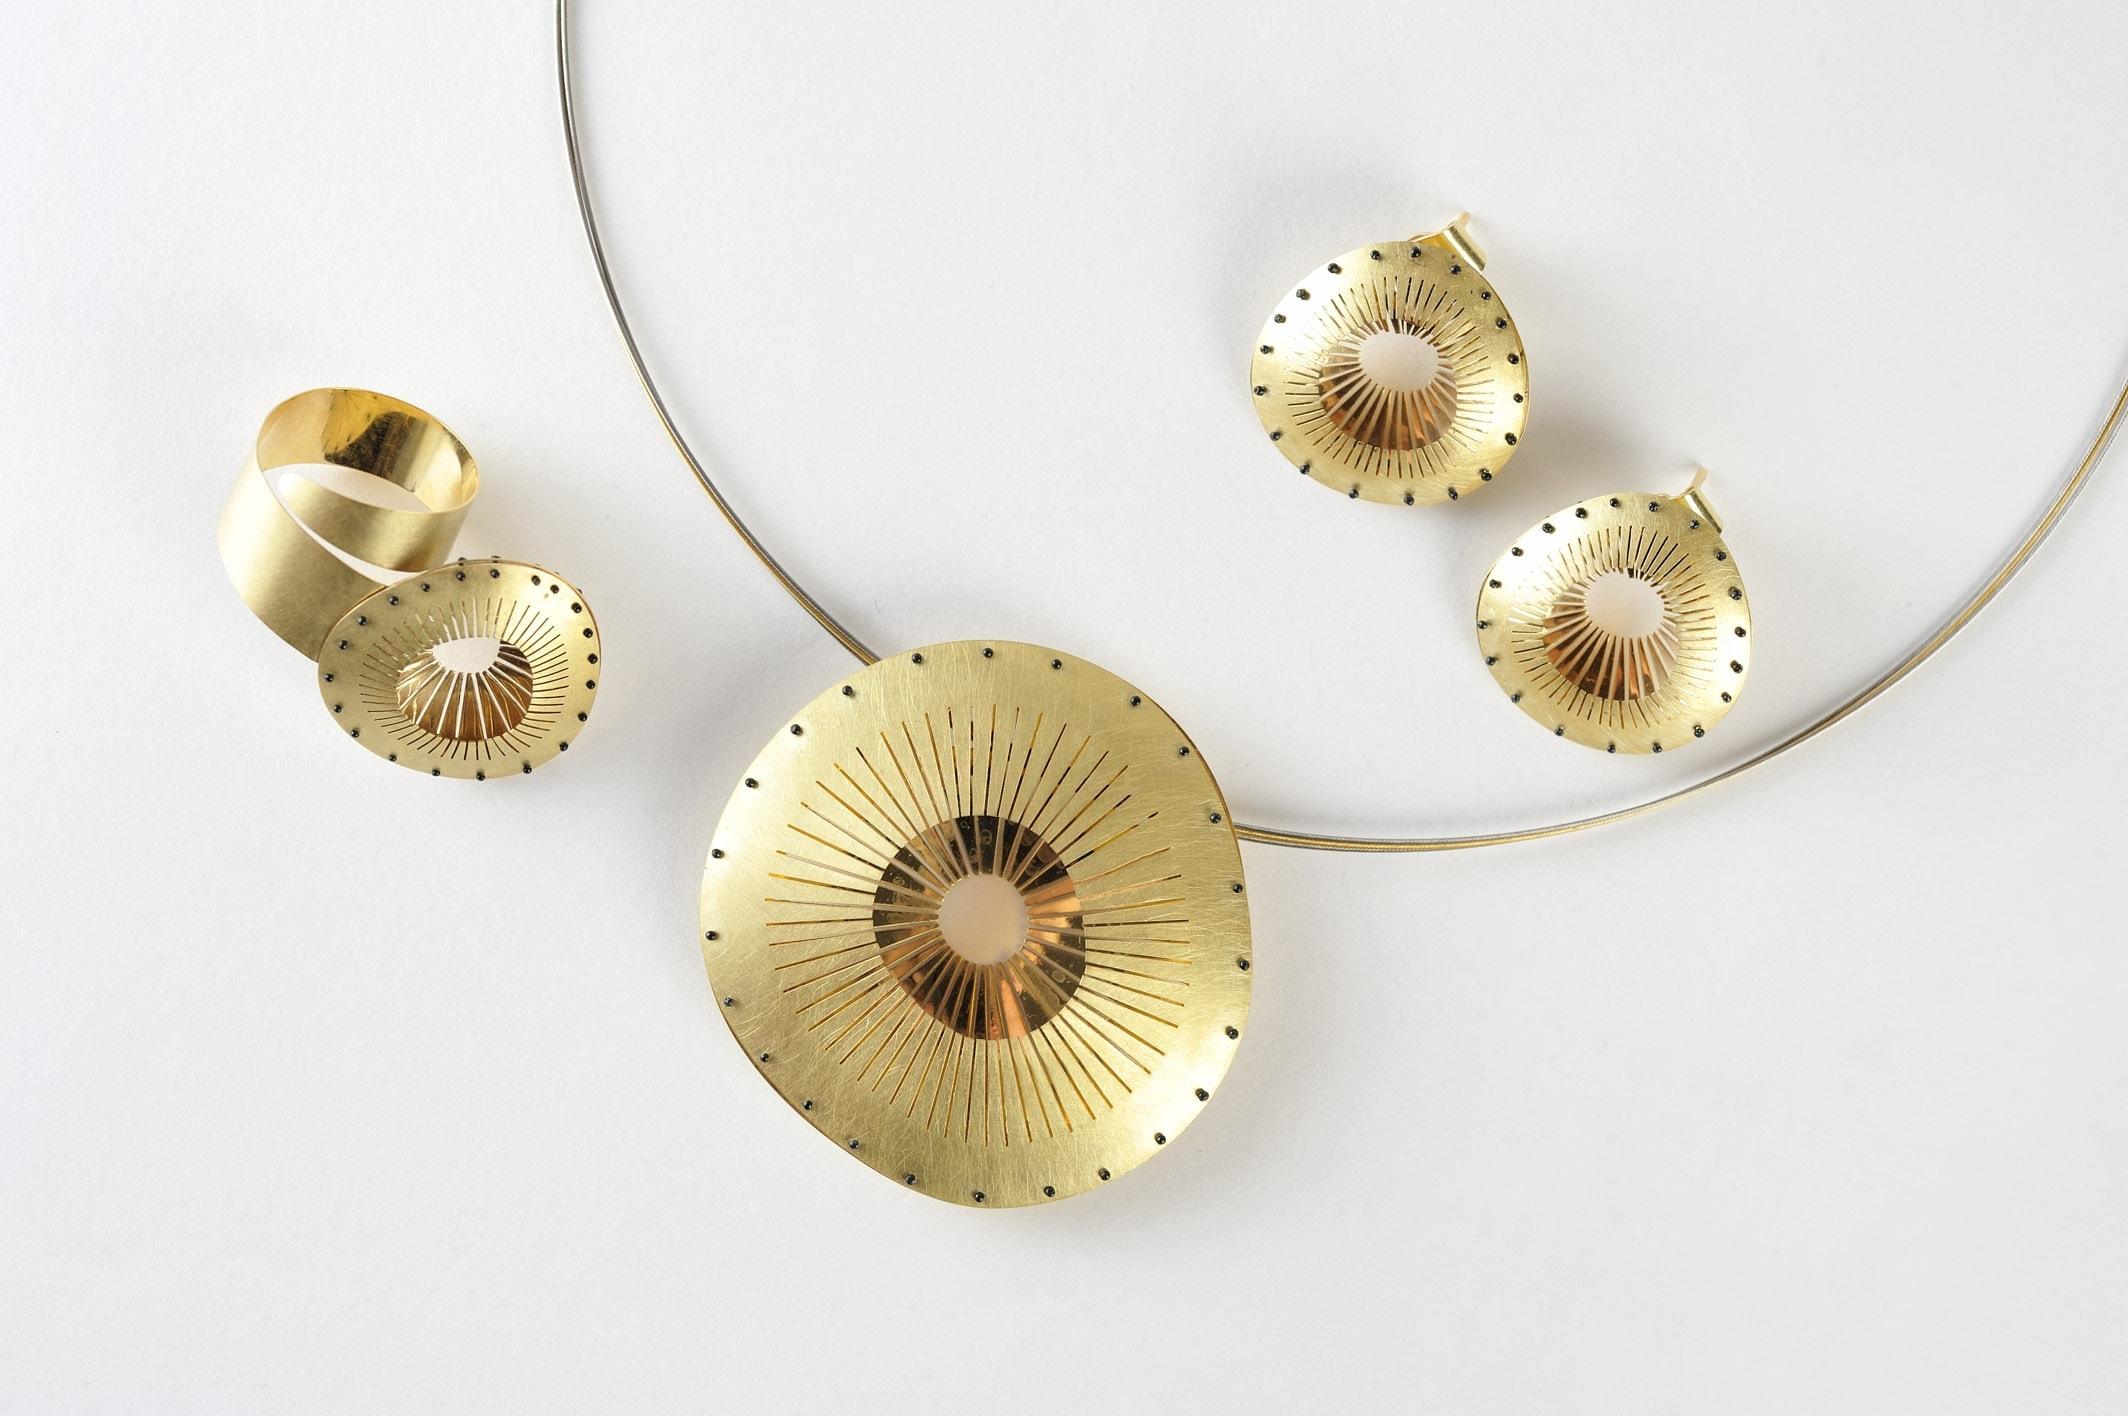 jewellery photographer jerusalem